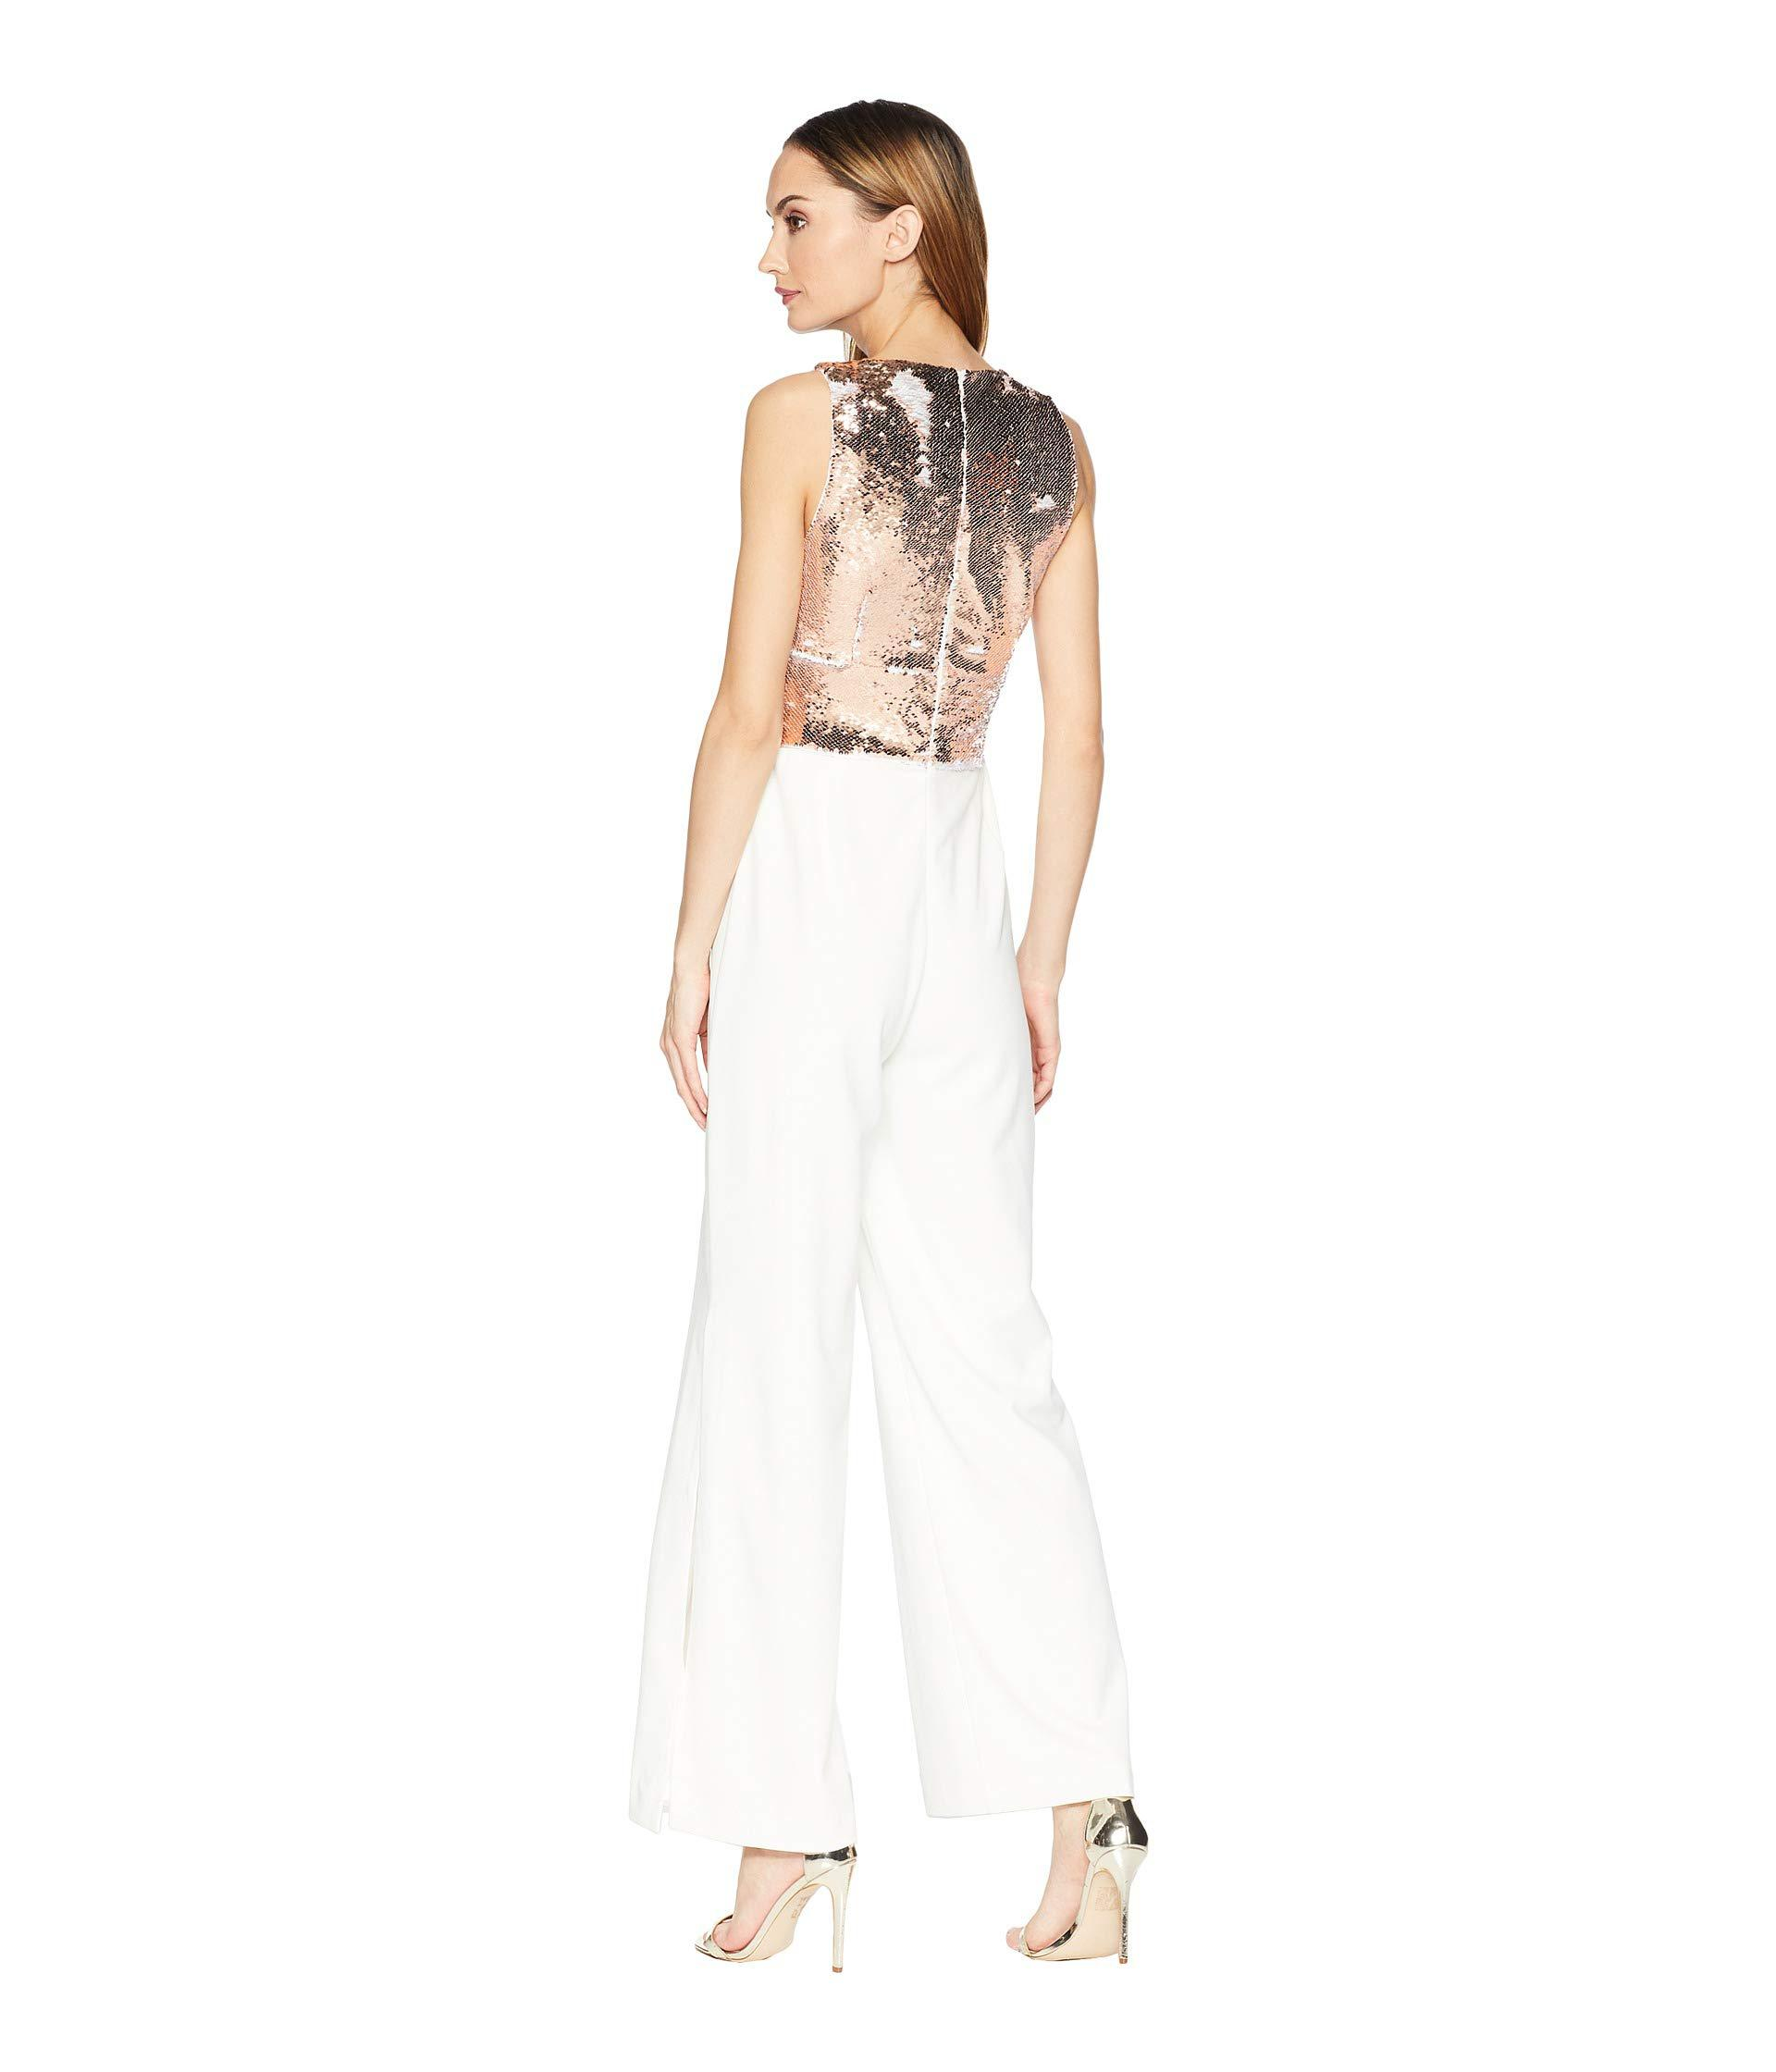 4d84086d62 Lyst - Alexia Admor Mixed Sequin Split-hem Jumpsuit in White - Save 16%